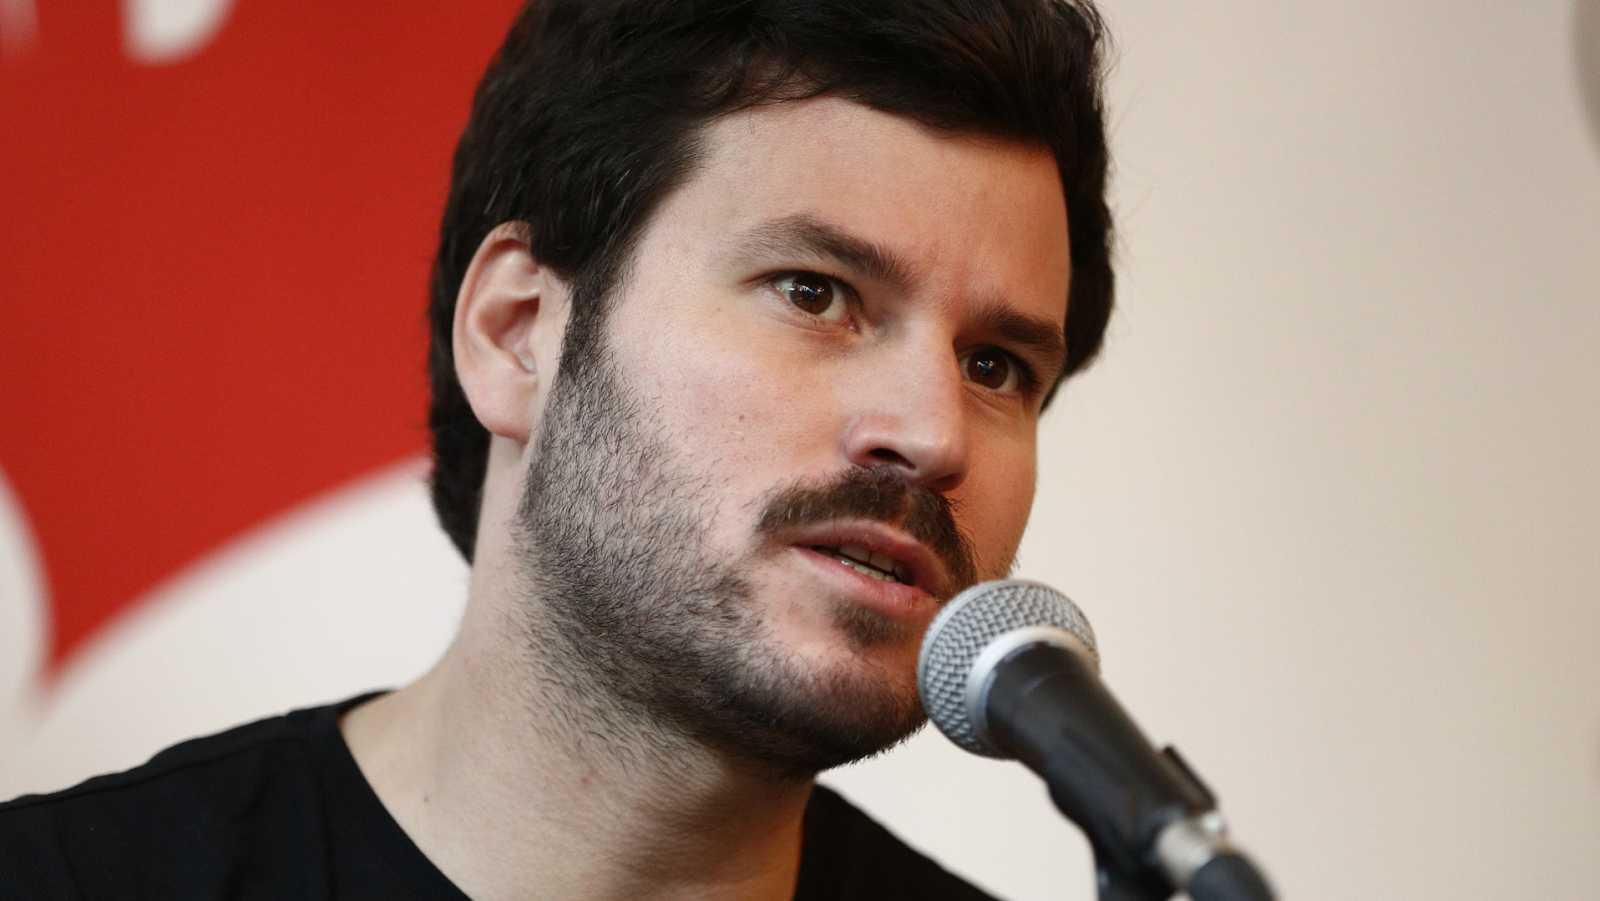 Willy Bárcenas, vocalista del grupo musical Taburete